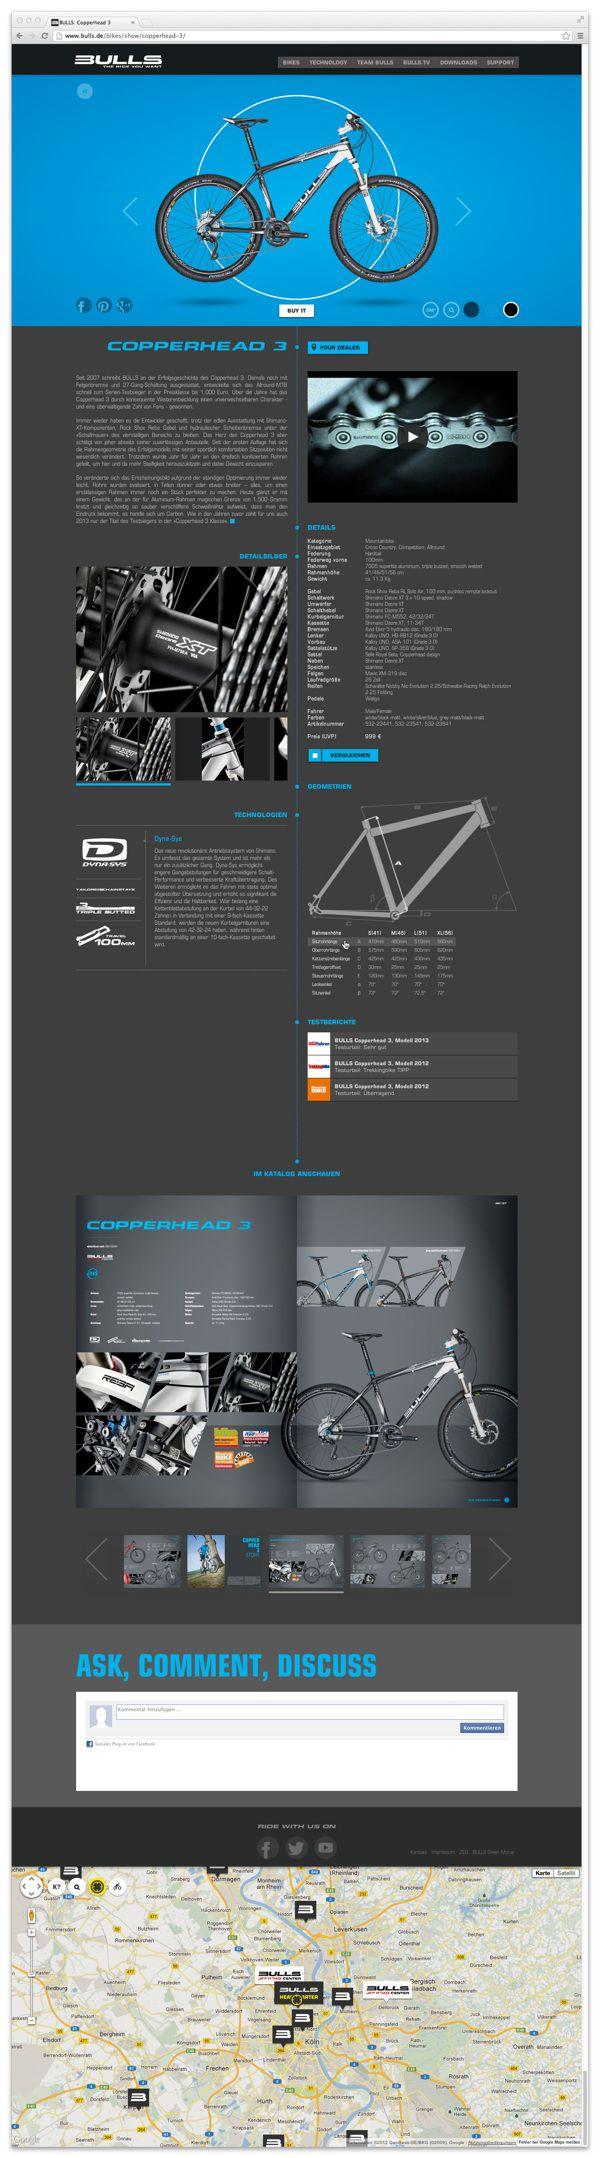 BULLS.DE on Web Design Served